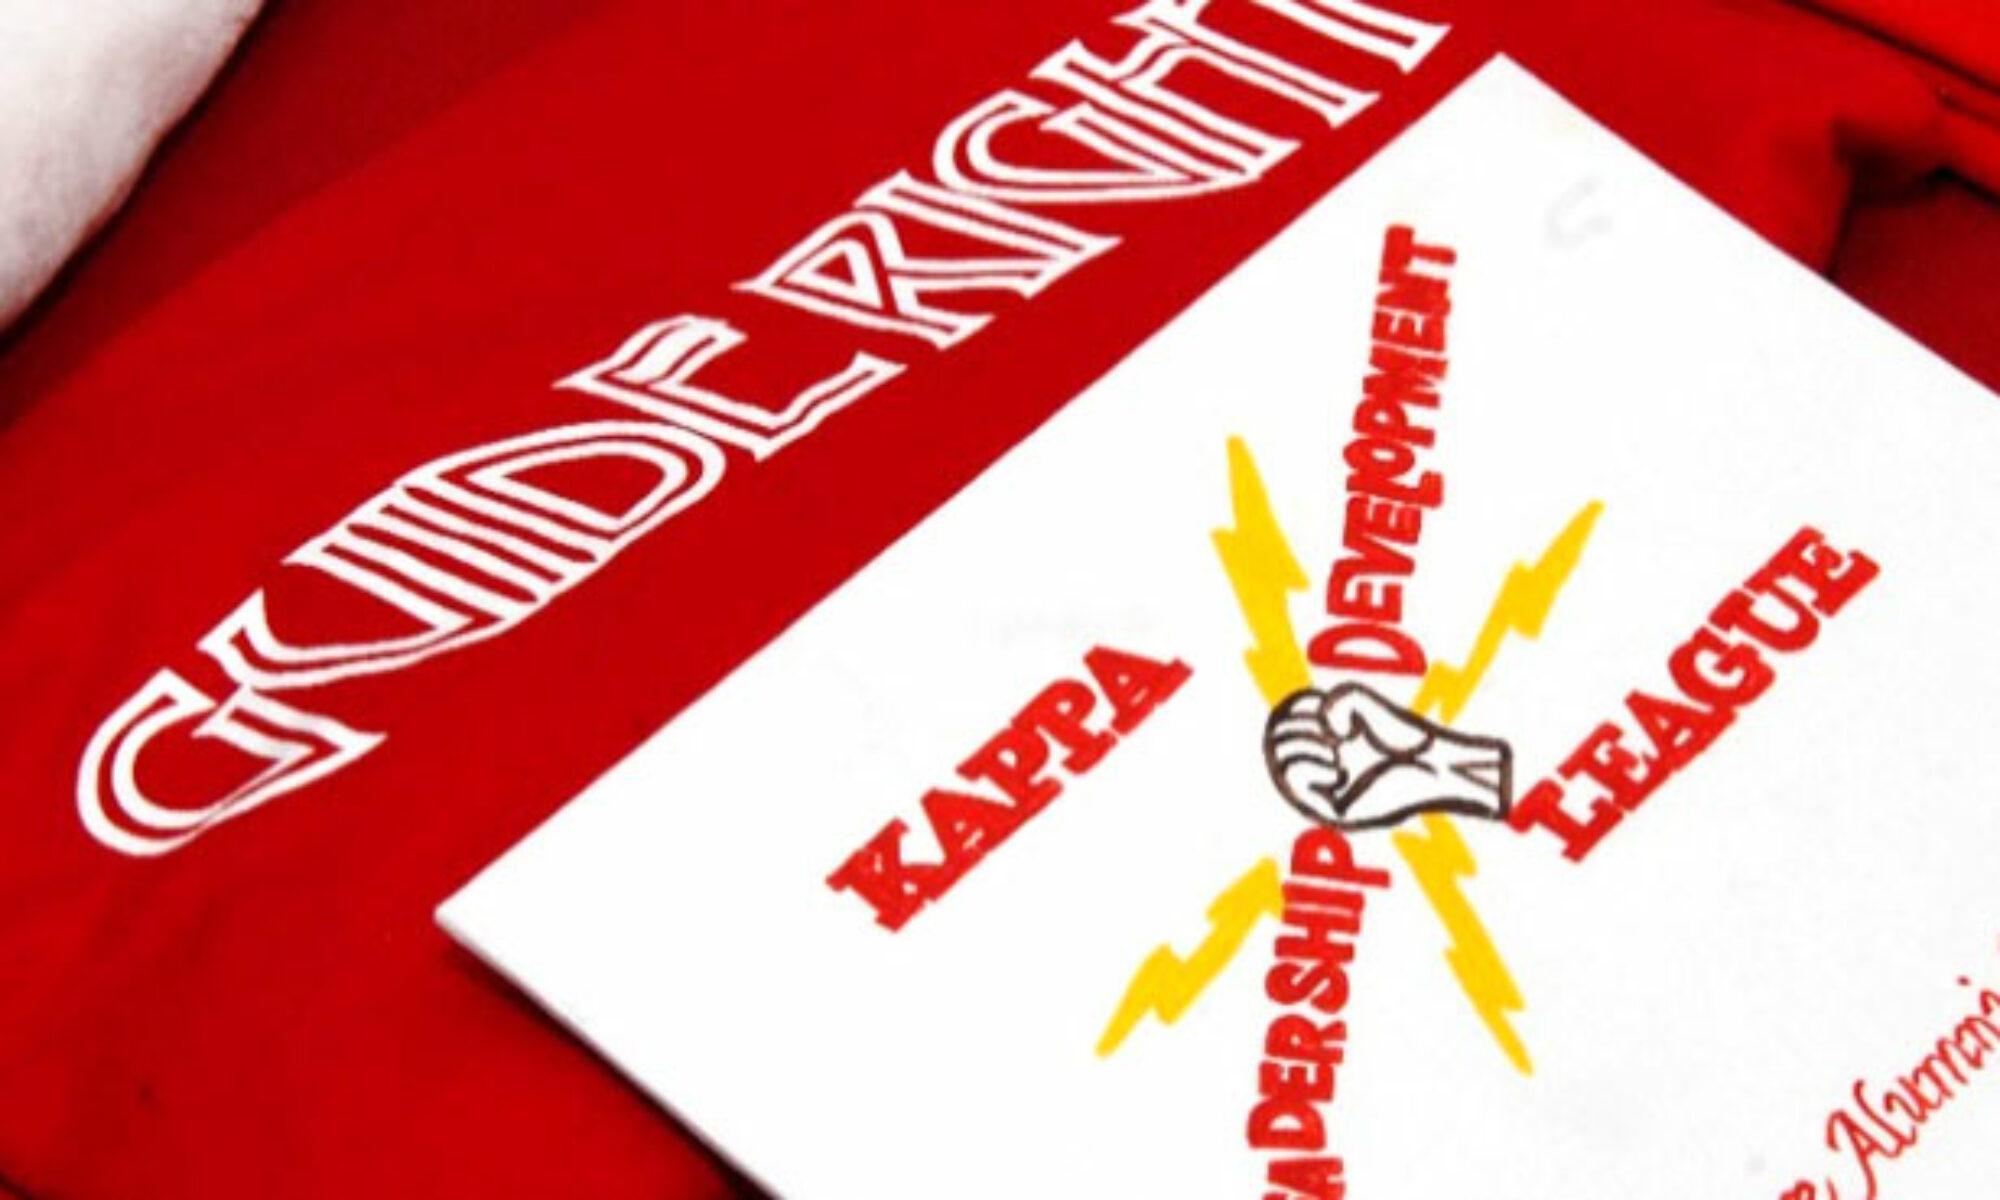 Kappa Alpha Psi Foundation of Metropolitan Baltimore